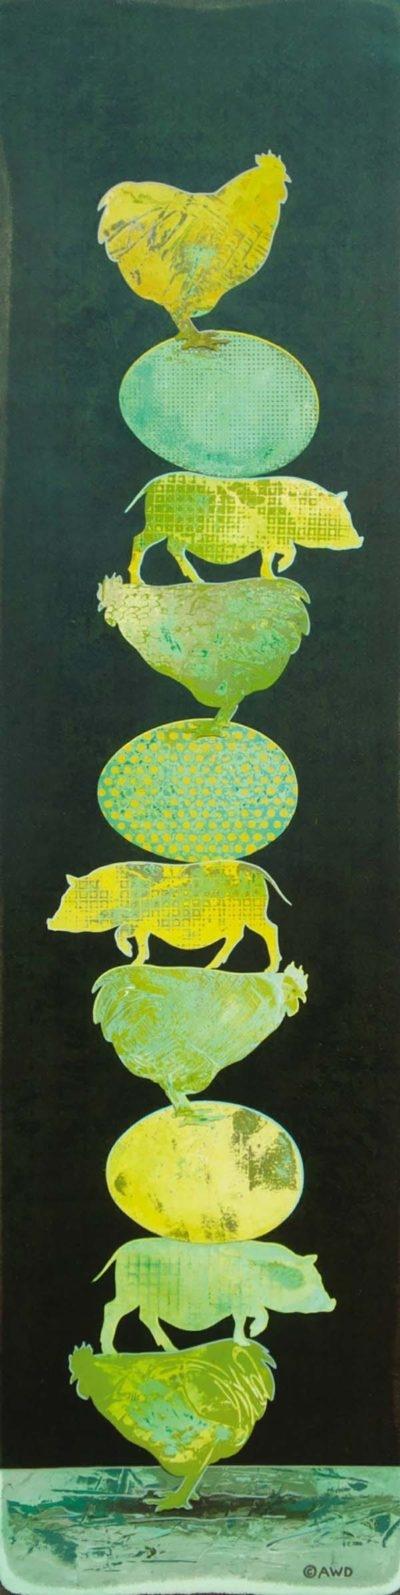 Tiny Totem #1 - Green Eggs & Ham - Andrew Denman